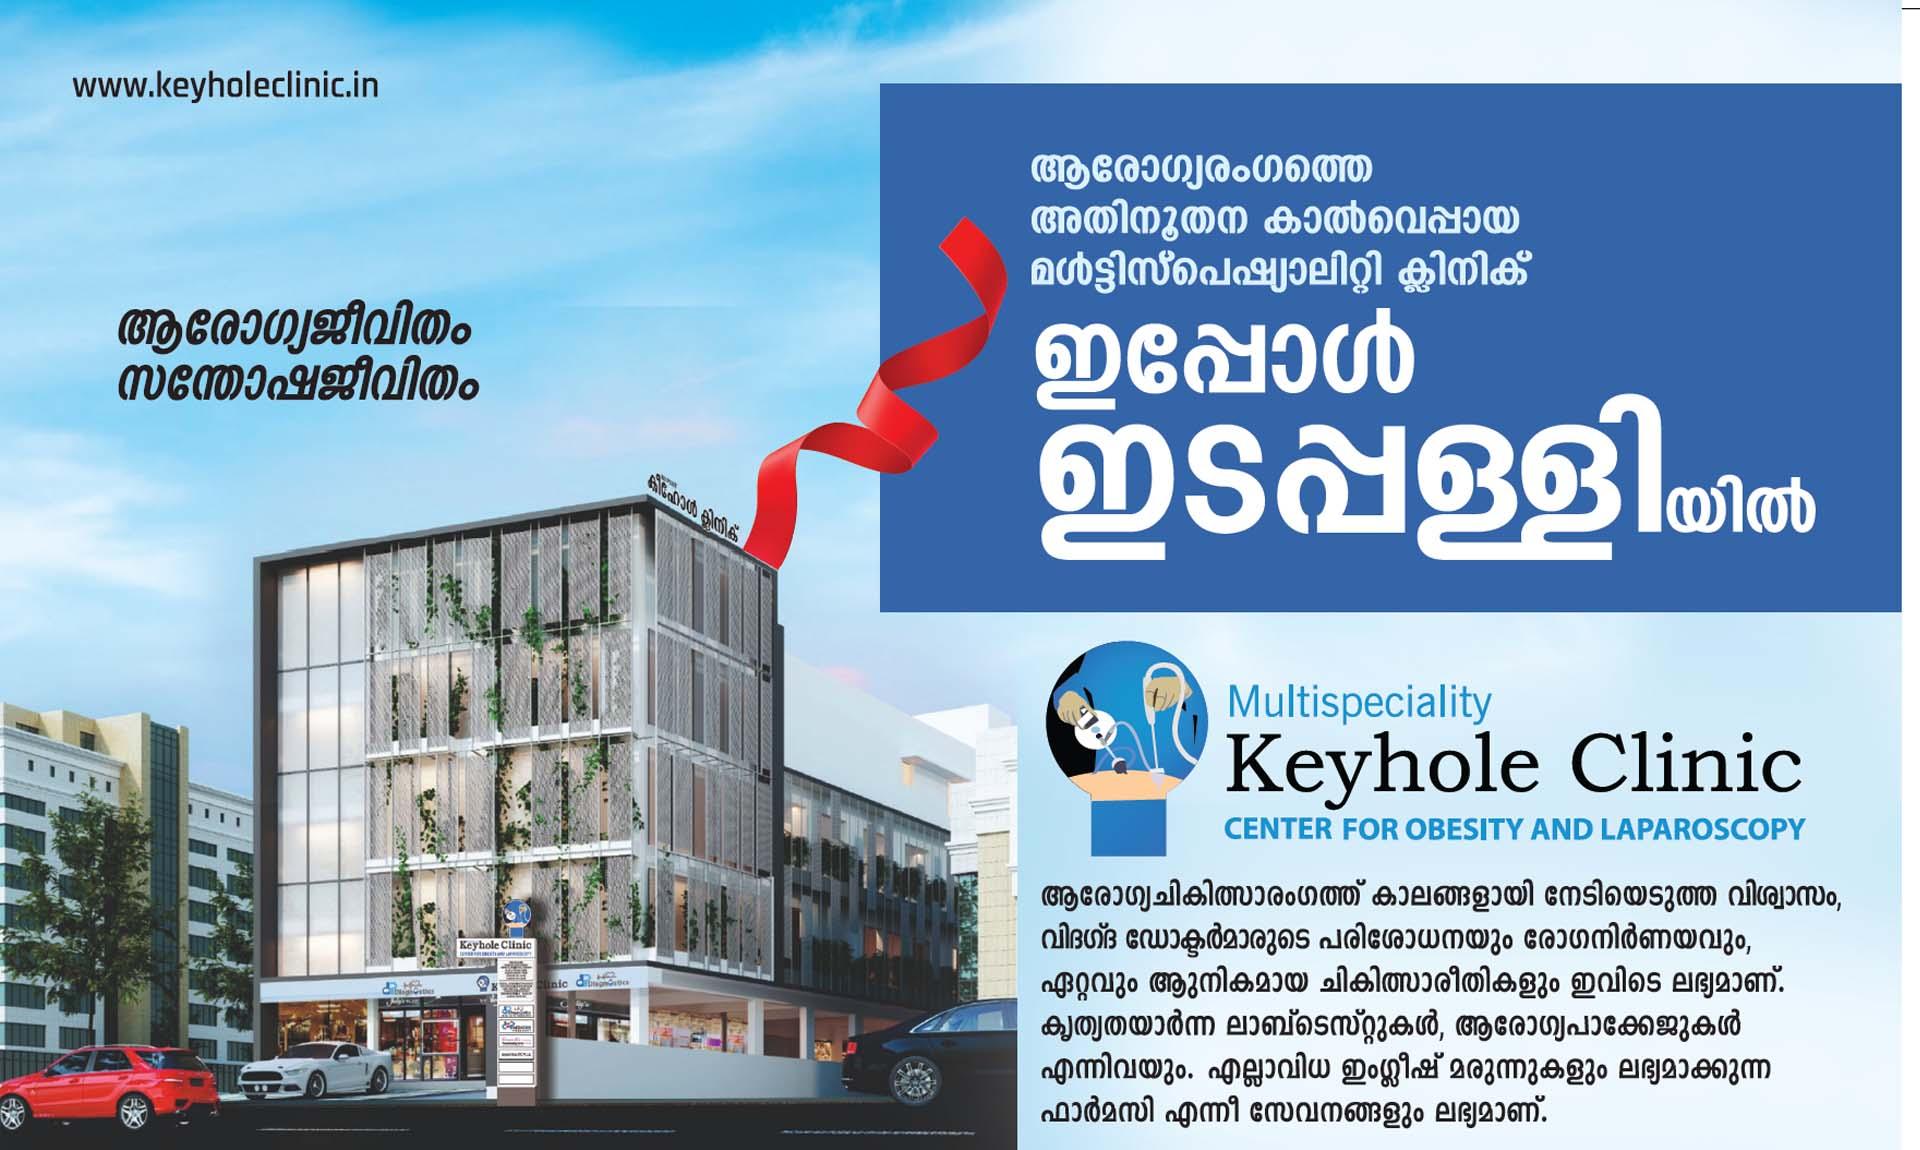 Keyhole Clinic Edappally